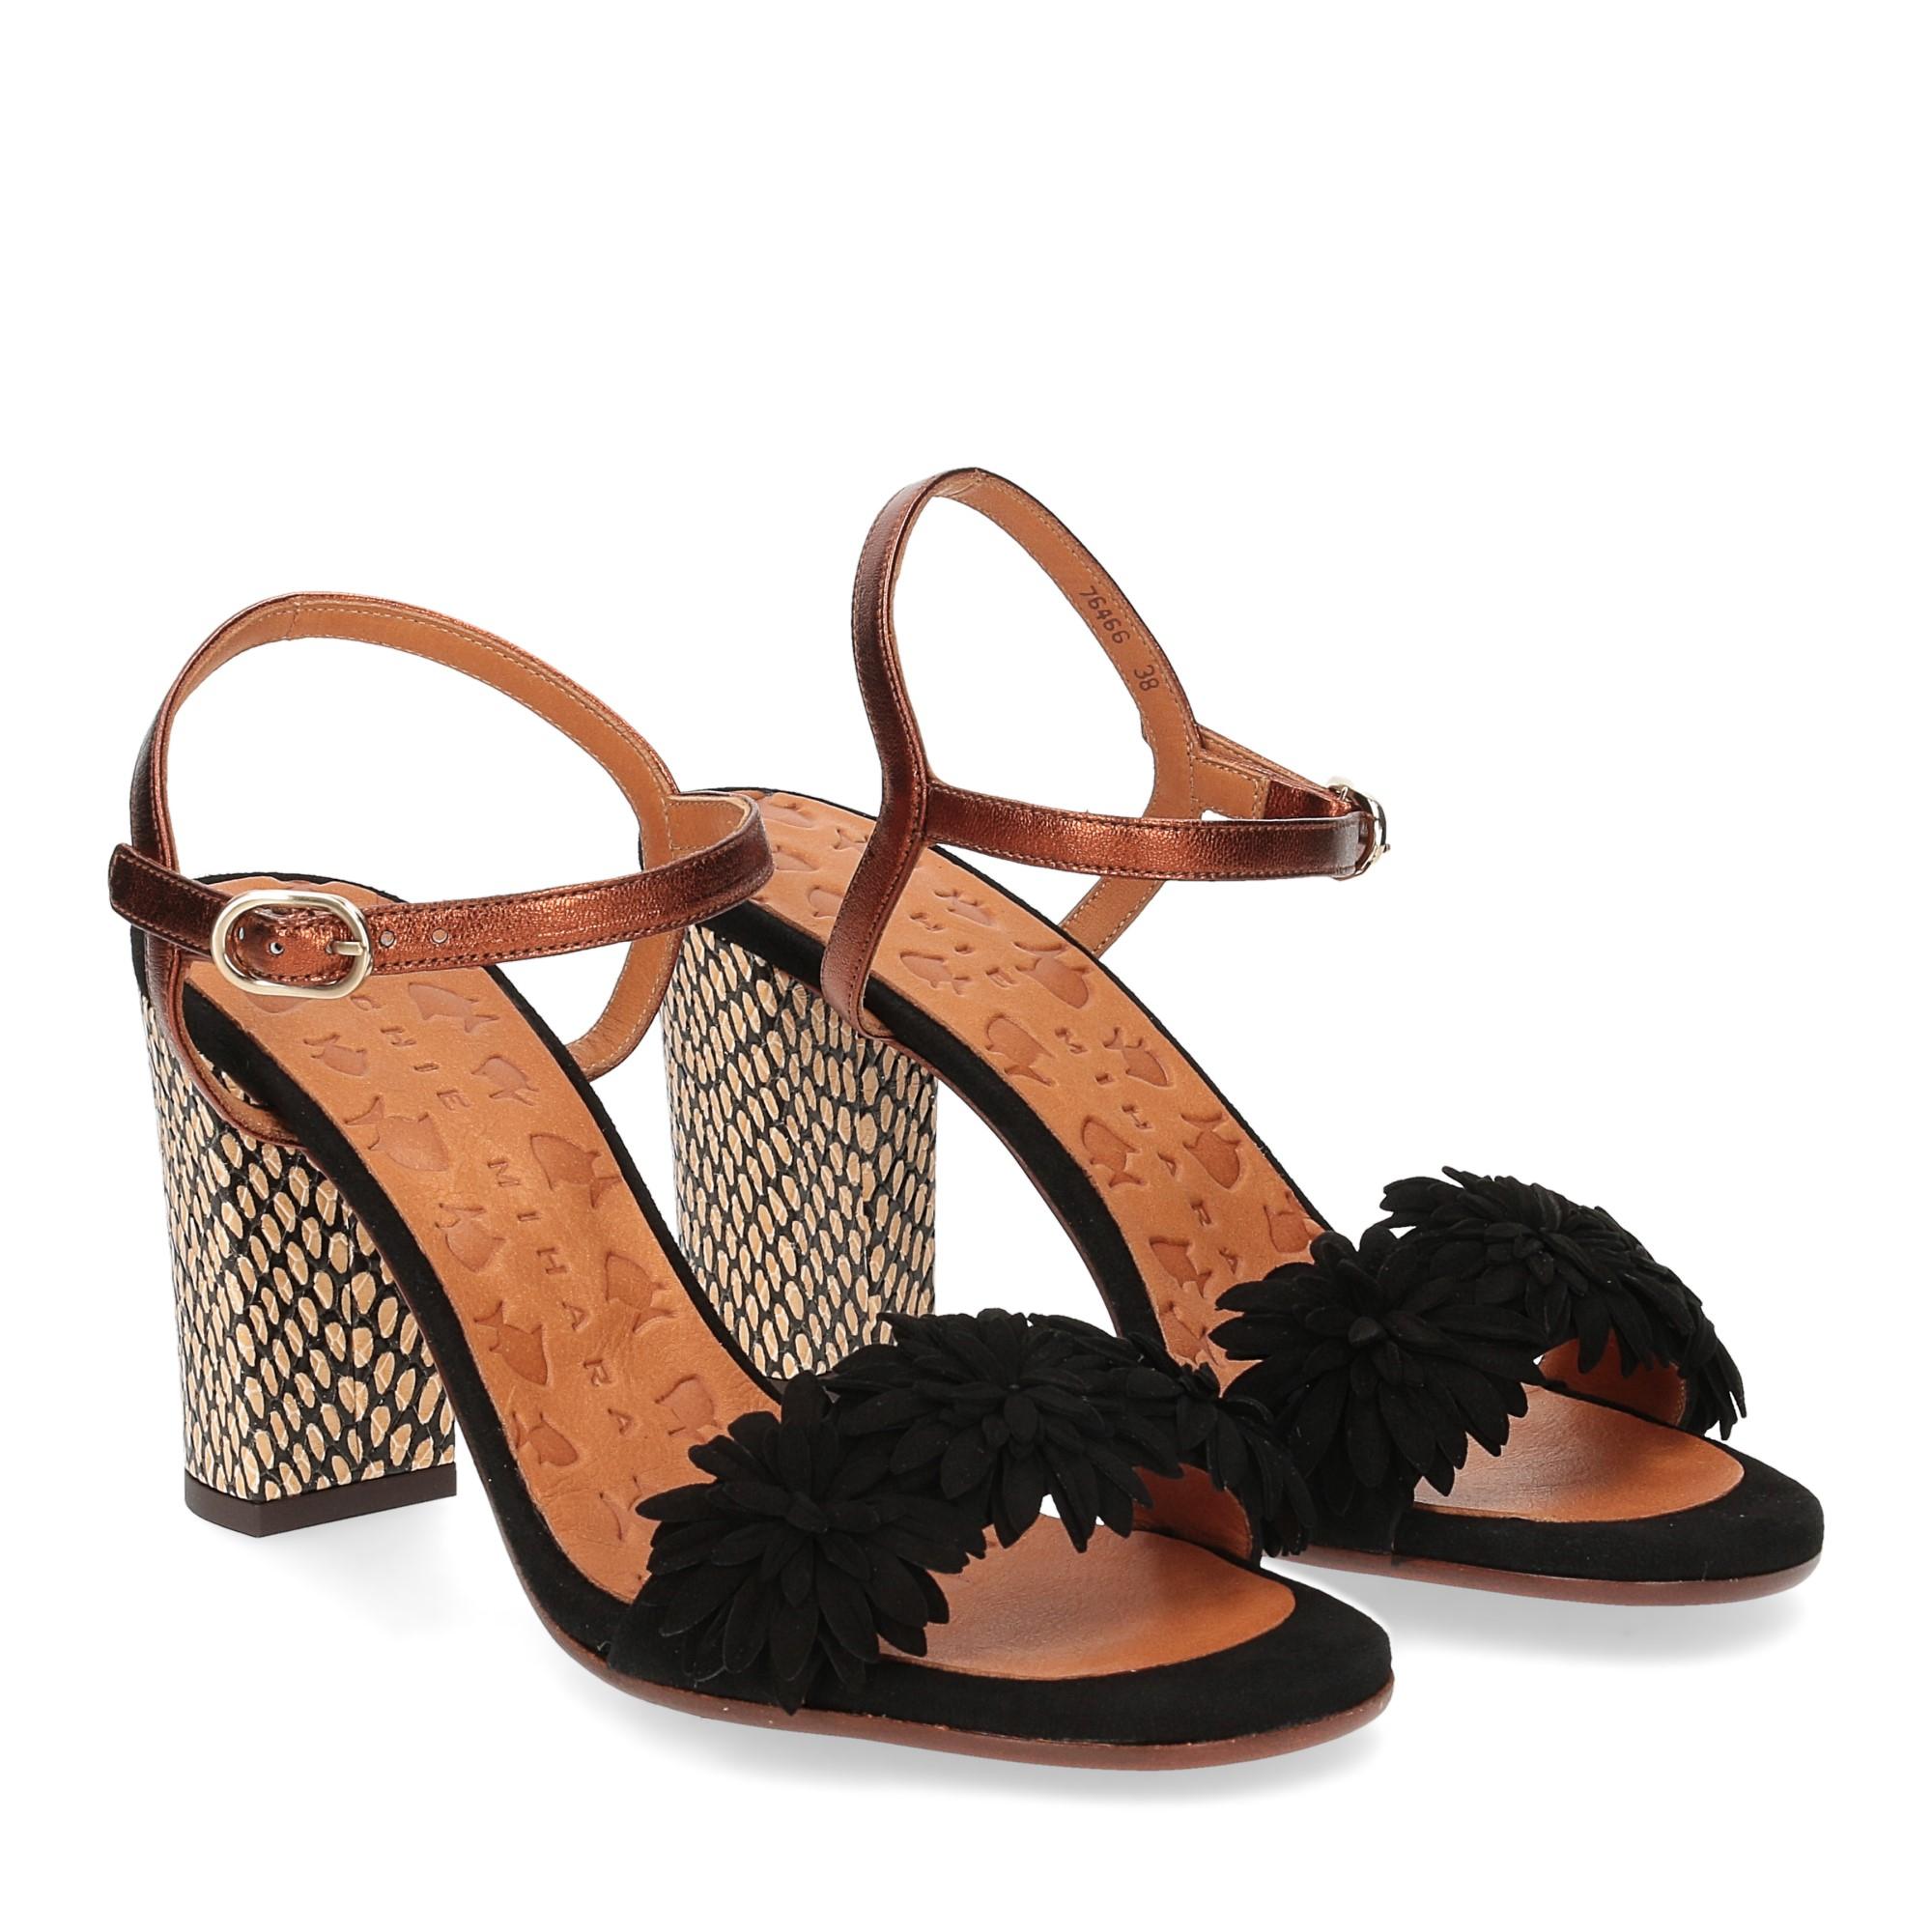 Chie Mihara sandalo Balis camoscio nero